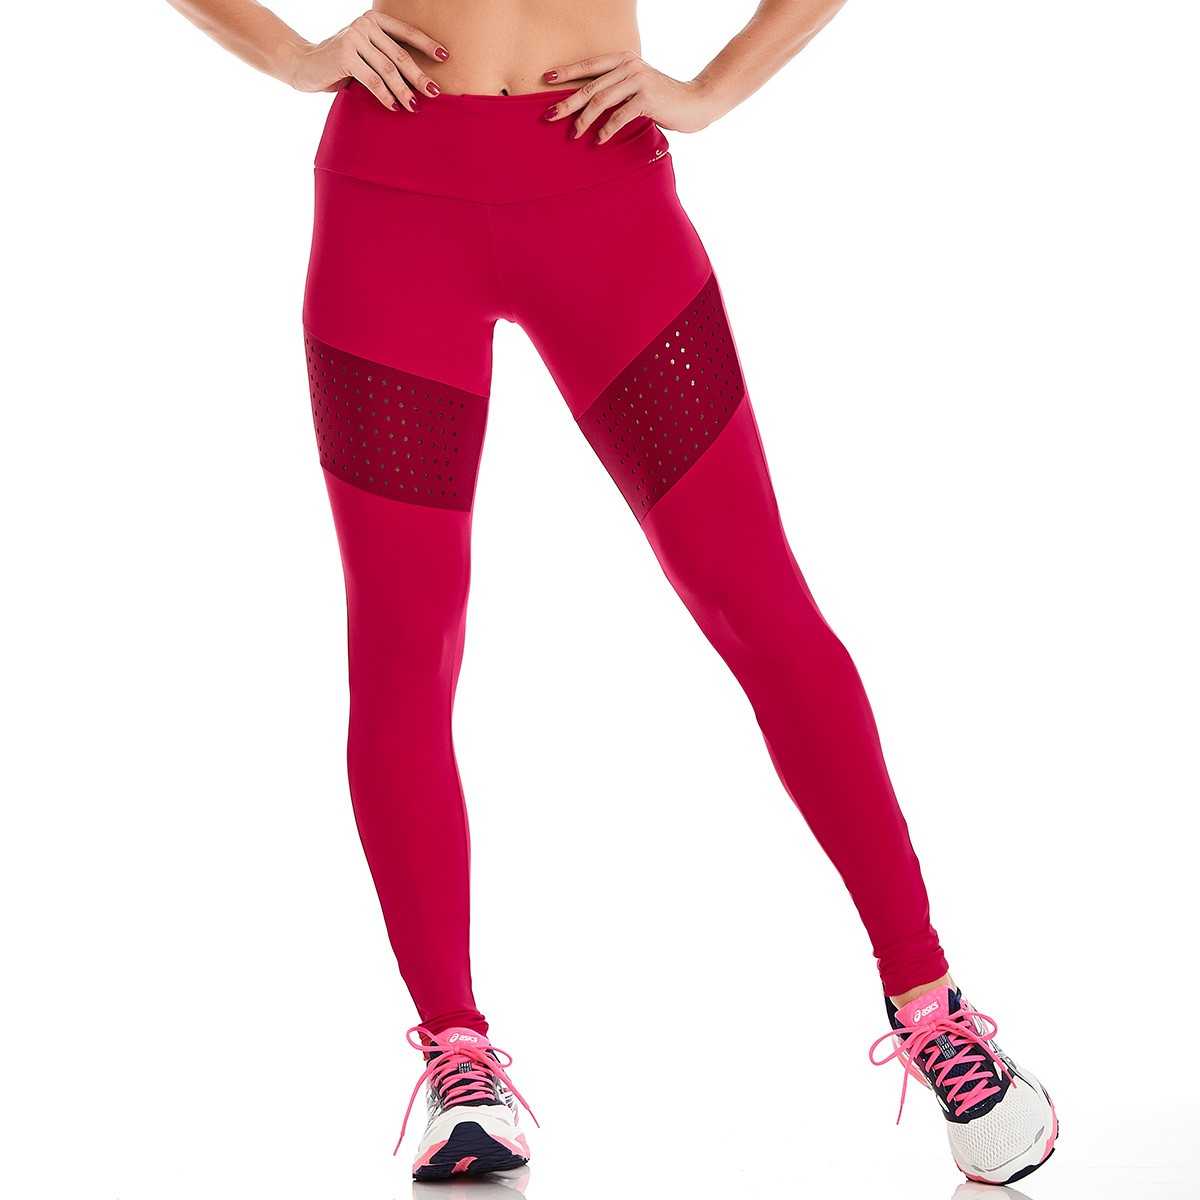 Legging Waterproof Laser Rosa CAJUBRASIL Activewear